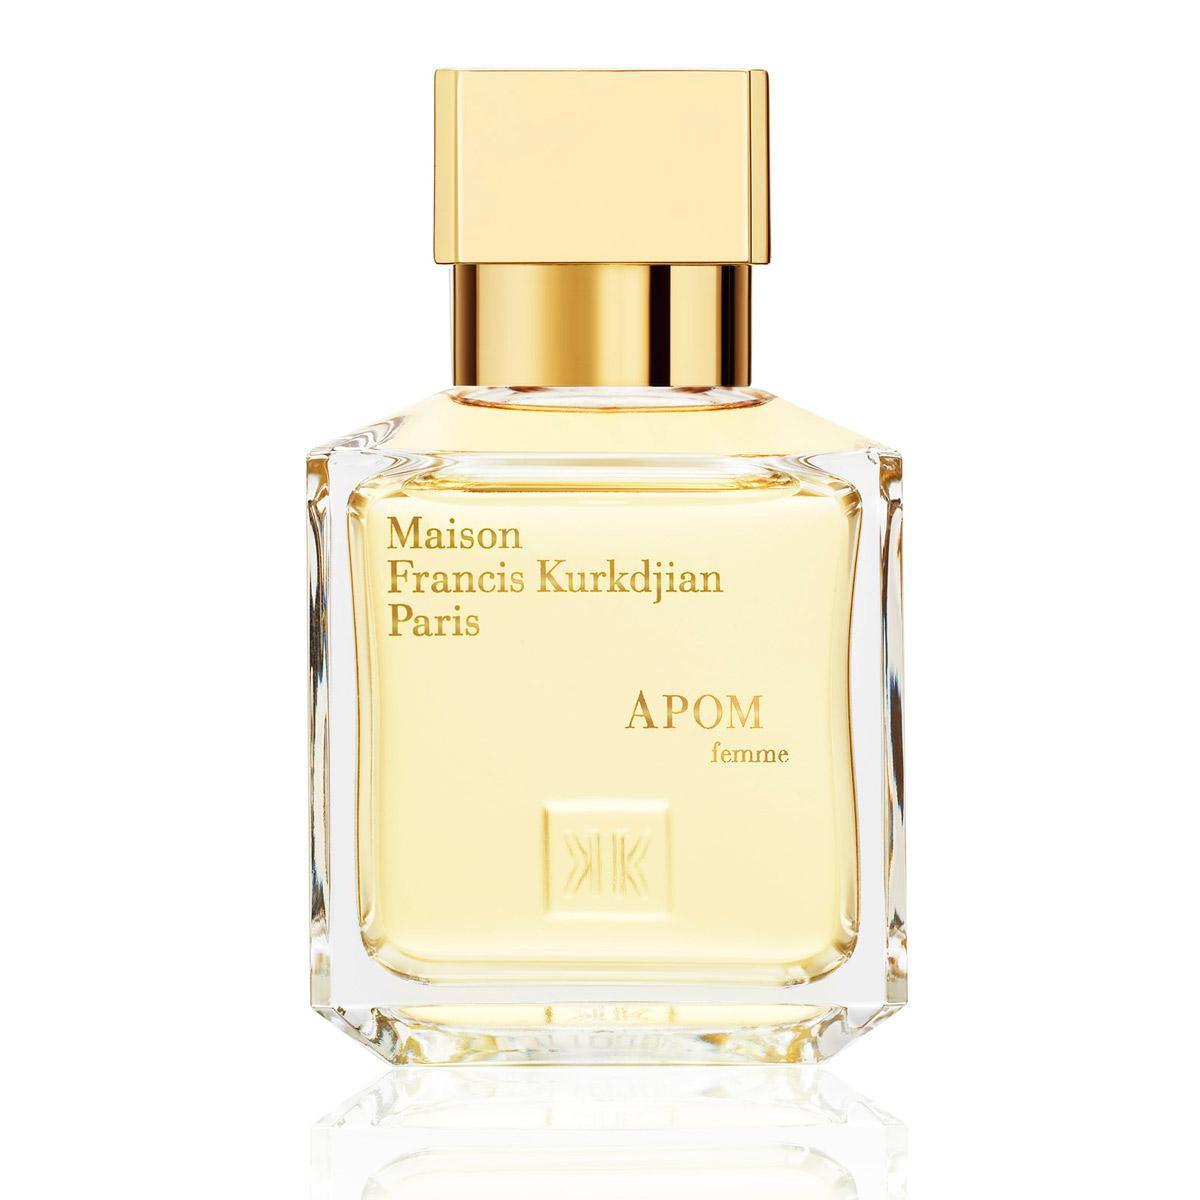 Maison Francis Kurkdjian APOM FEMME 70ml ORIGINAL